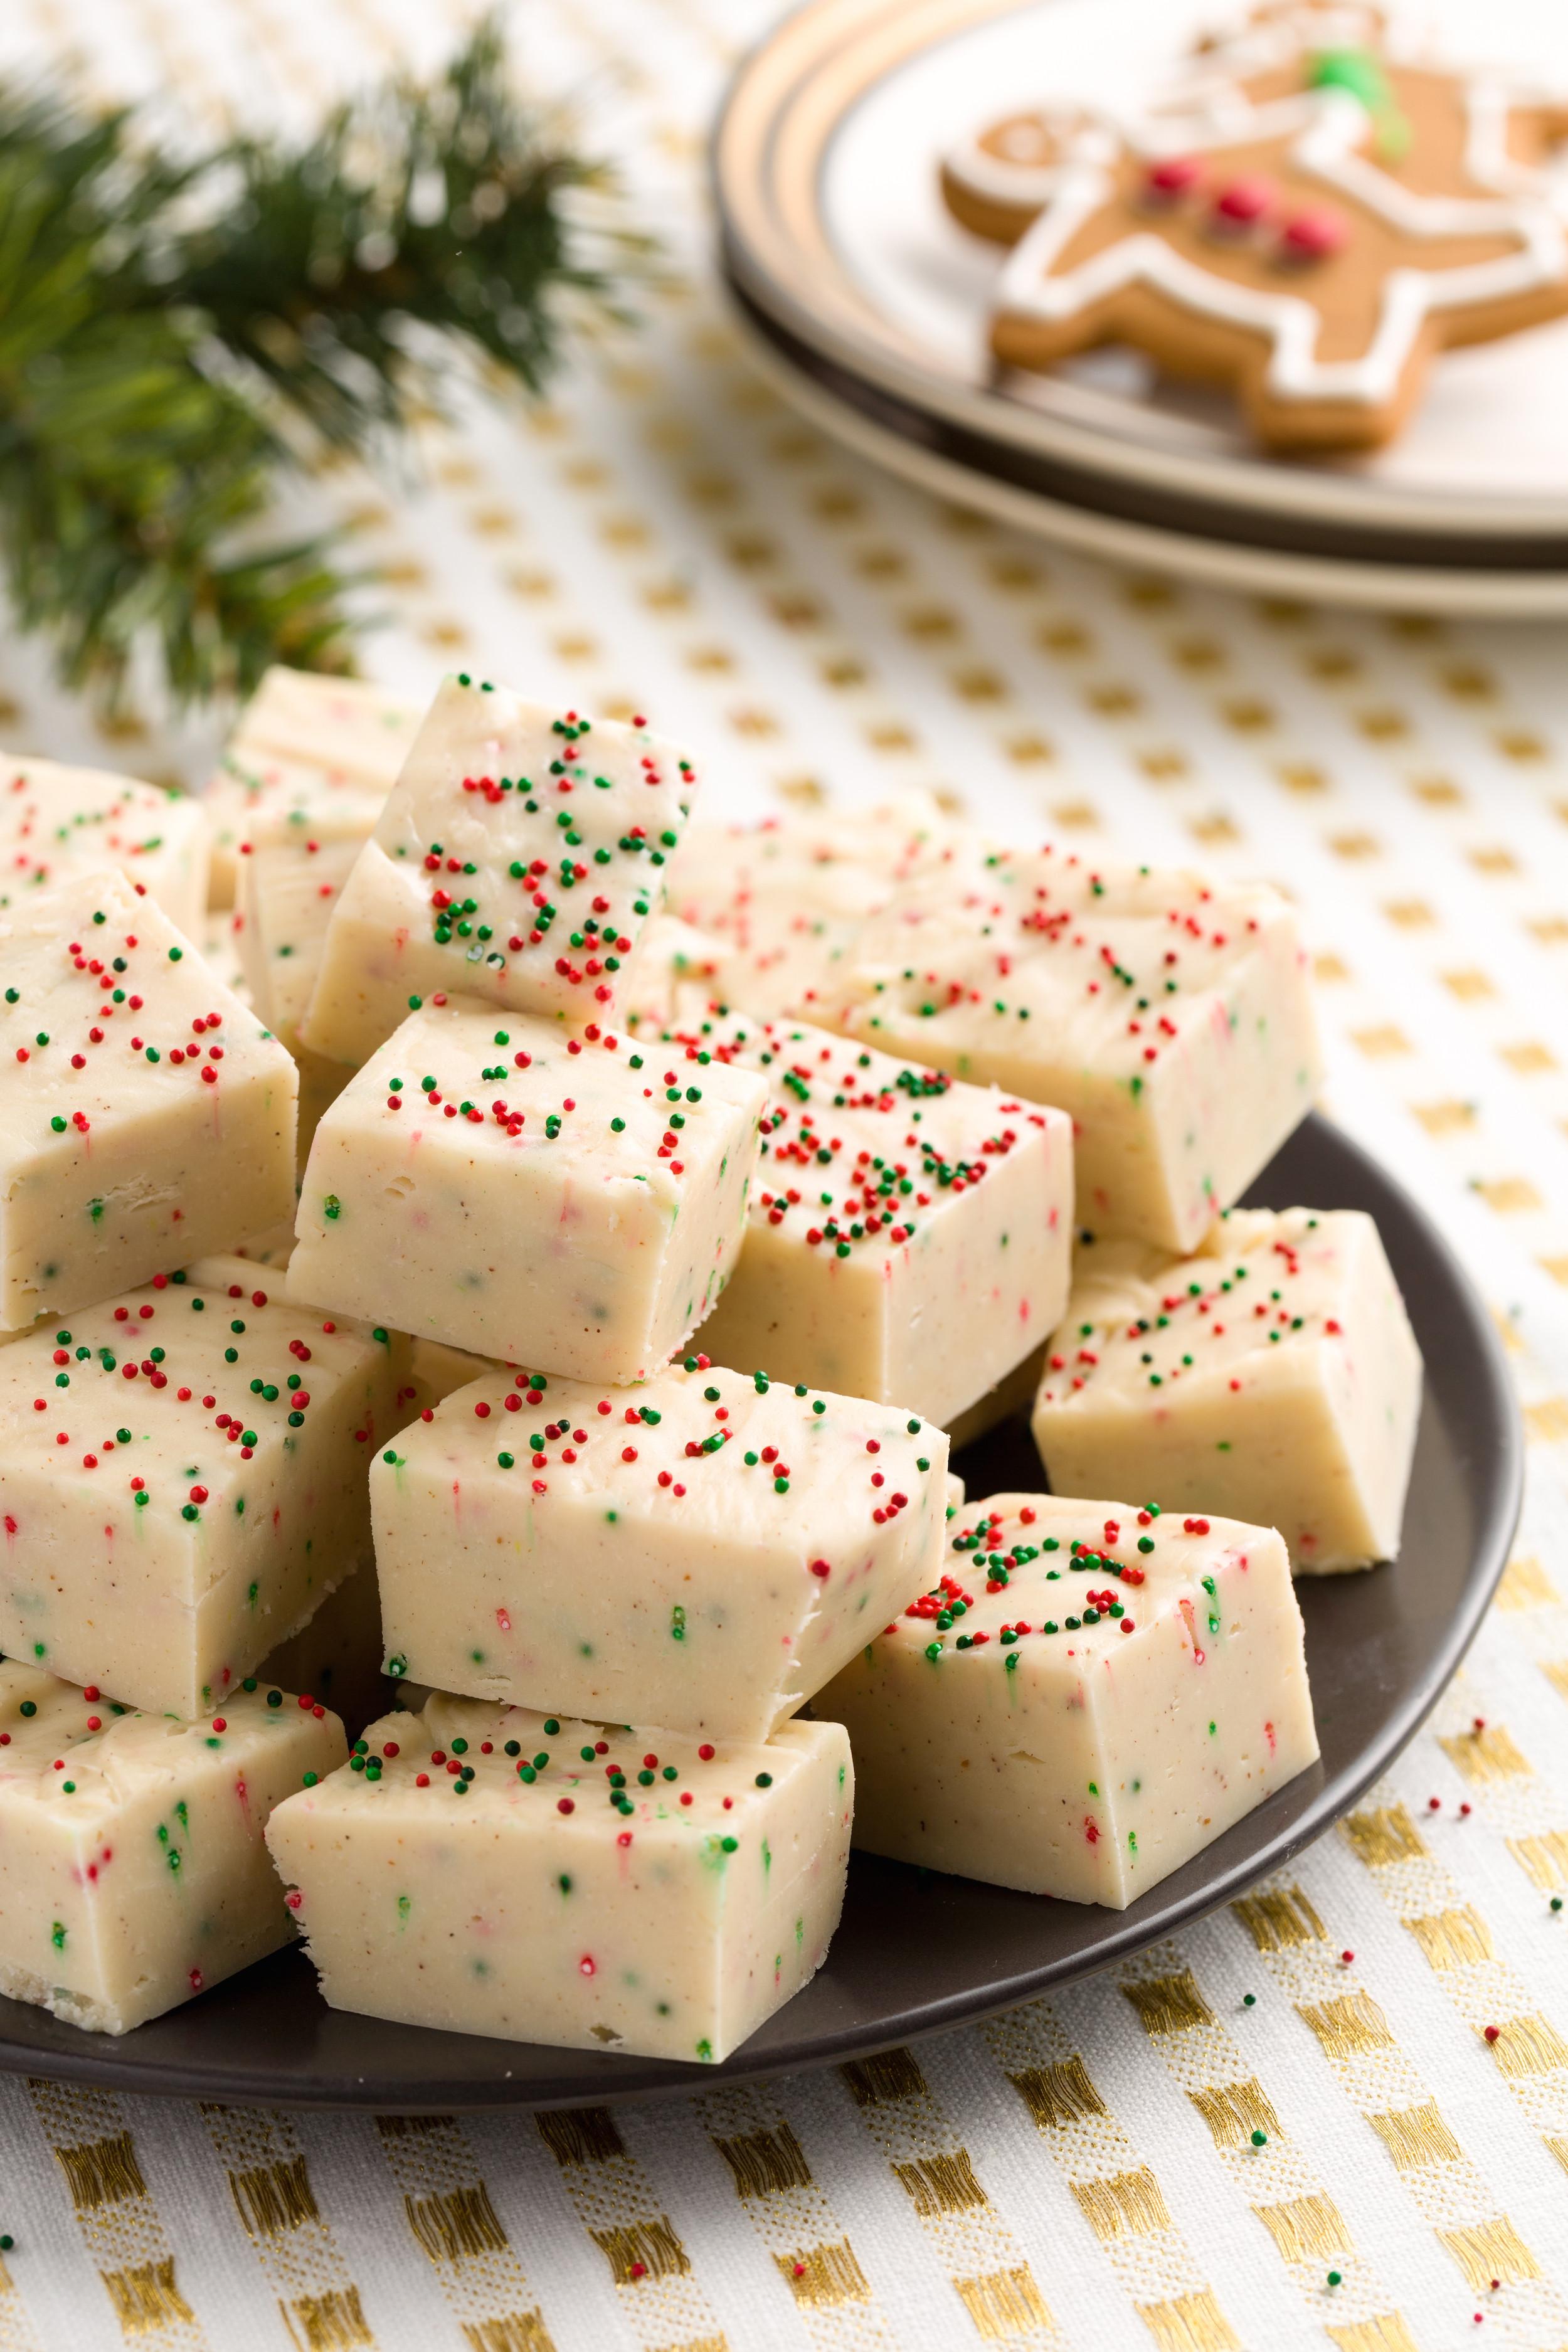 Christmas Candy Recipes  18 Easy Homemade Christmas Candy Recipes How To Make